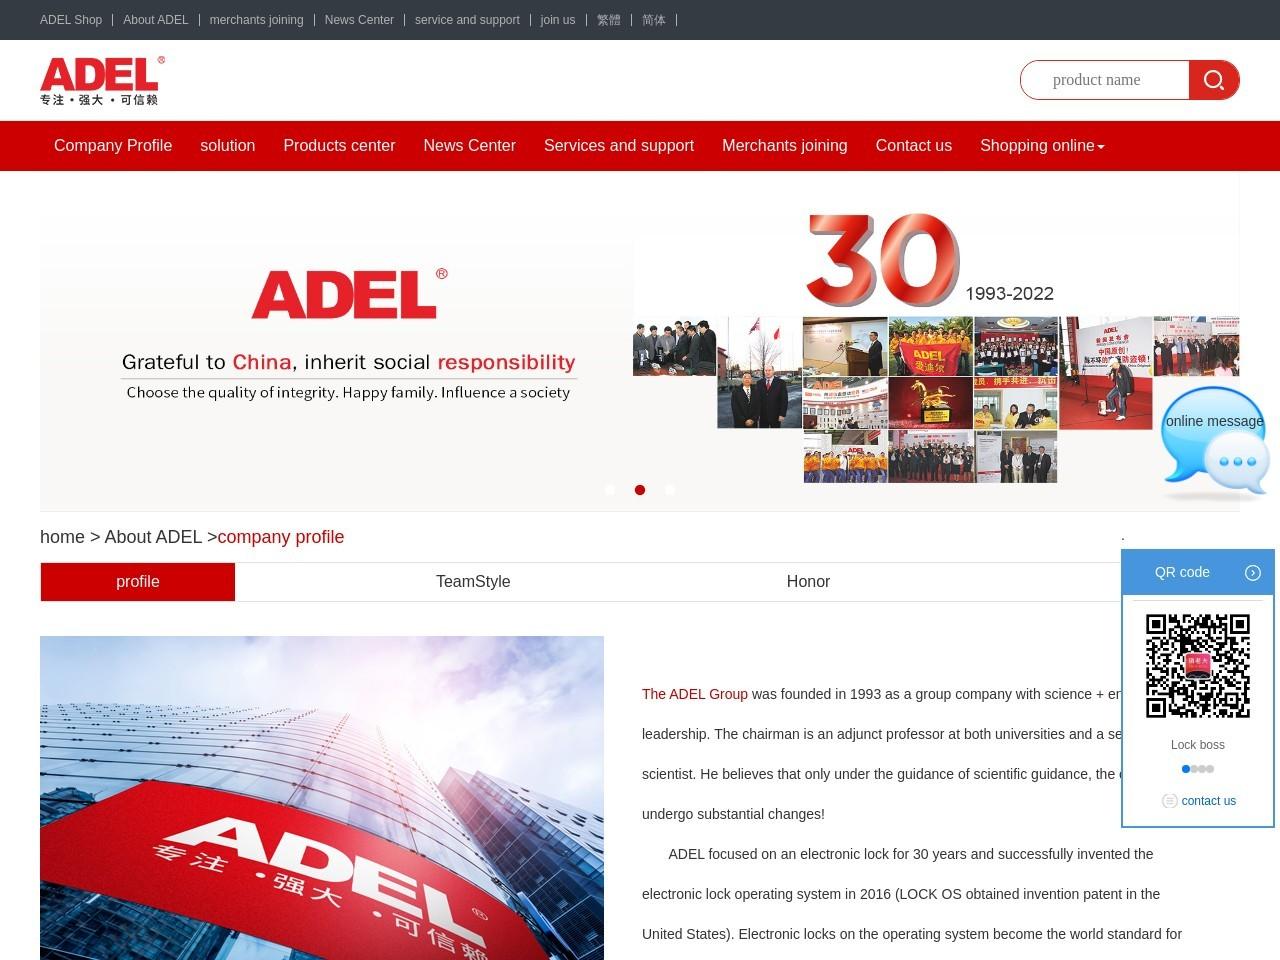 爱迪尔(ADEL)指纹锁官方网站